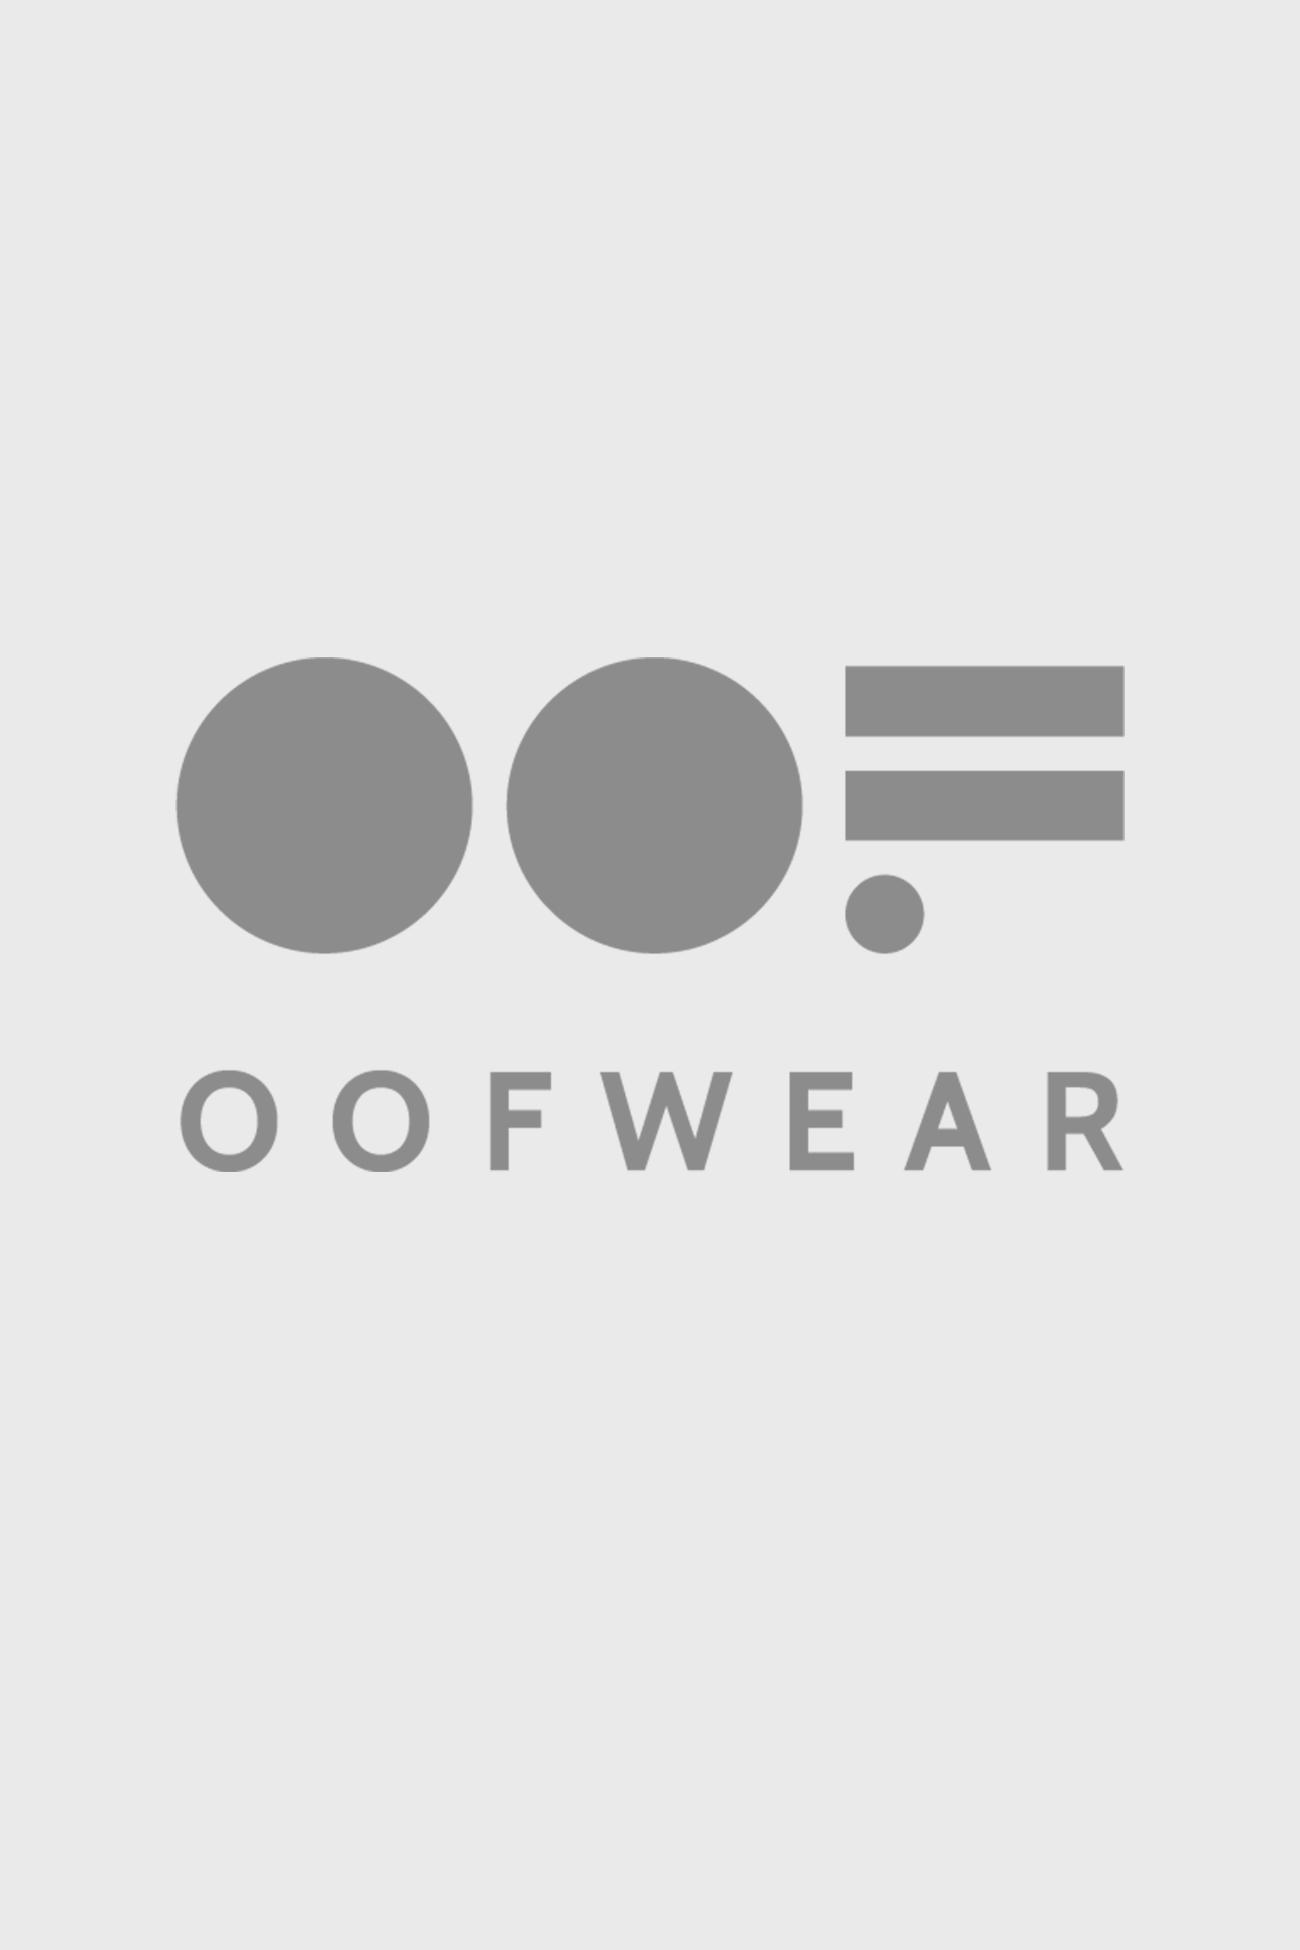 Short jacket 9409 in memory black